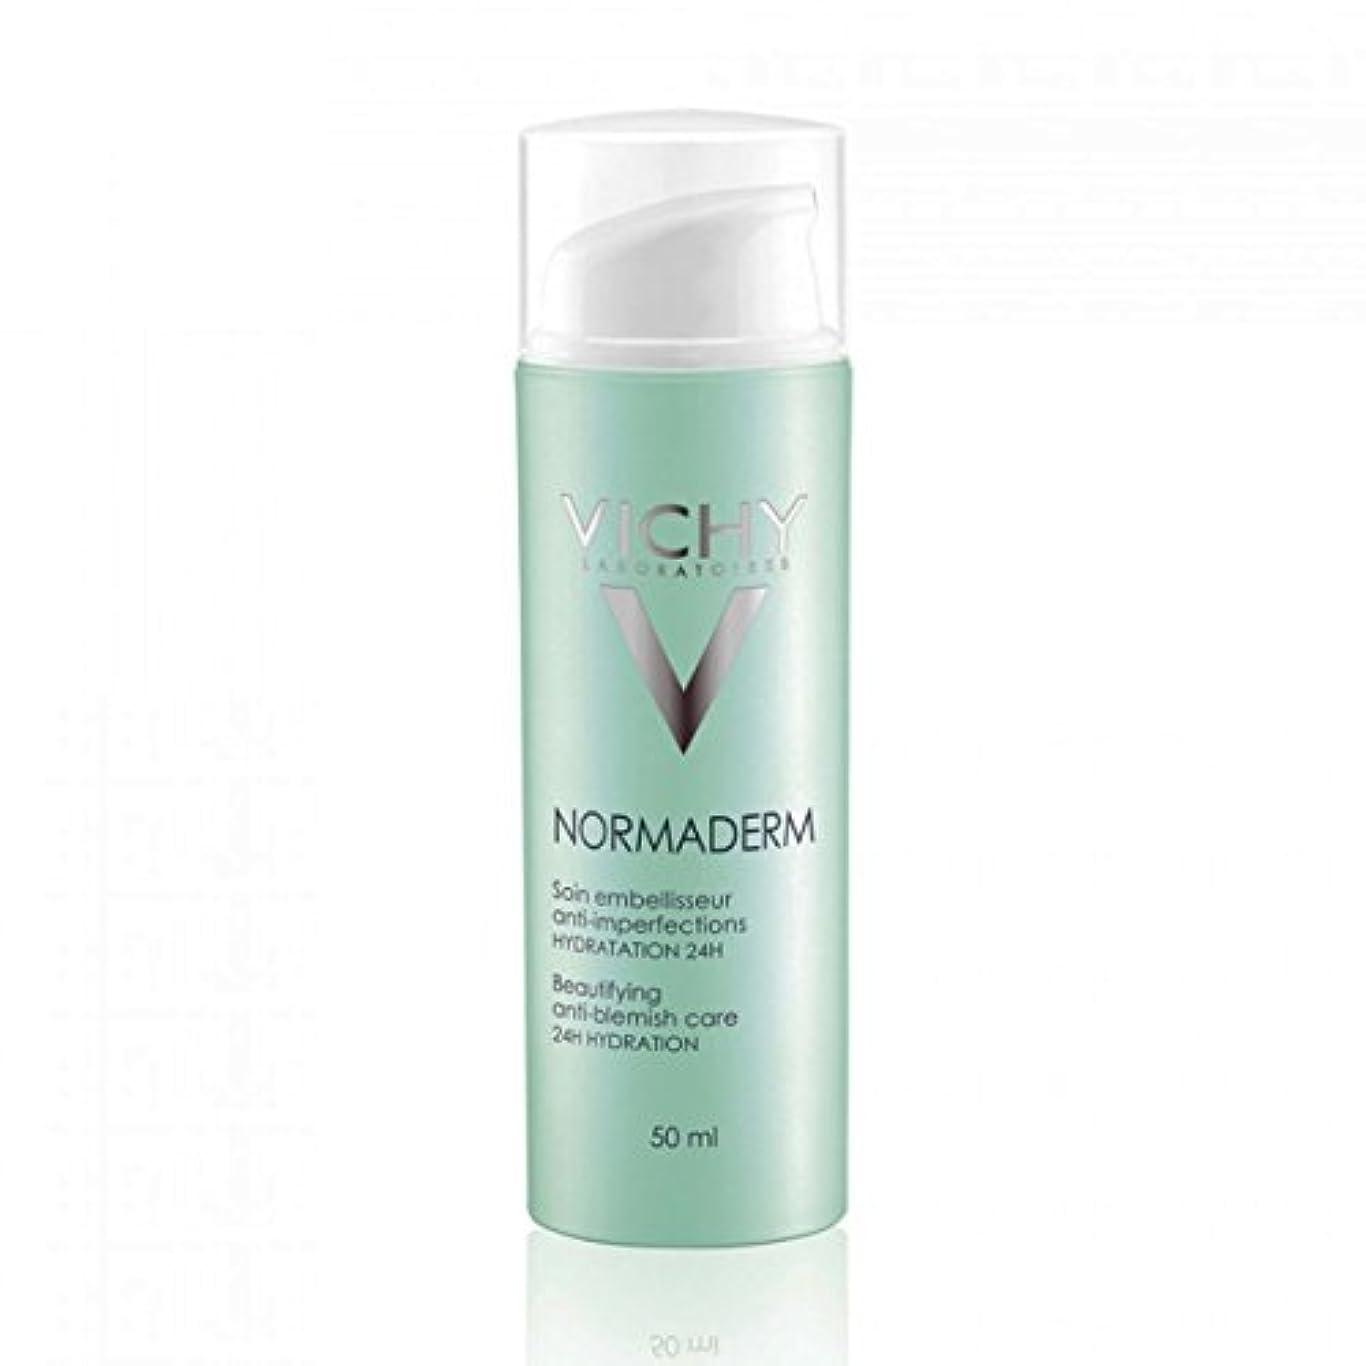 Vichy Normaderm Anti Imperfection Hydrating Cream 50ml [並行輸入品]